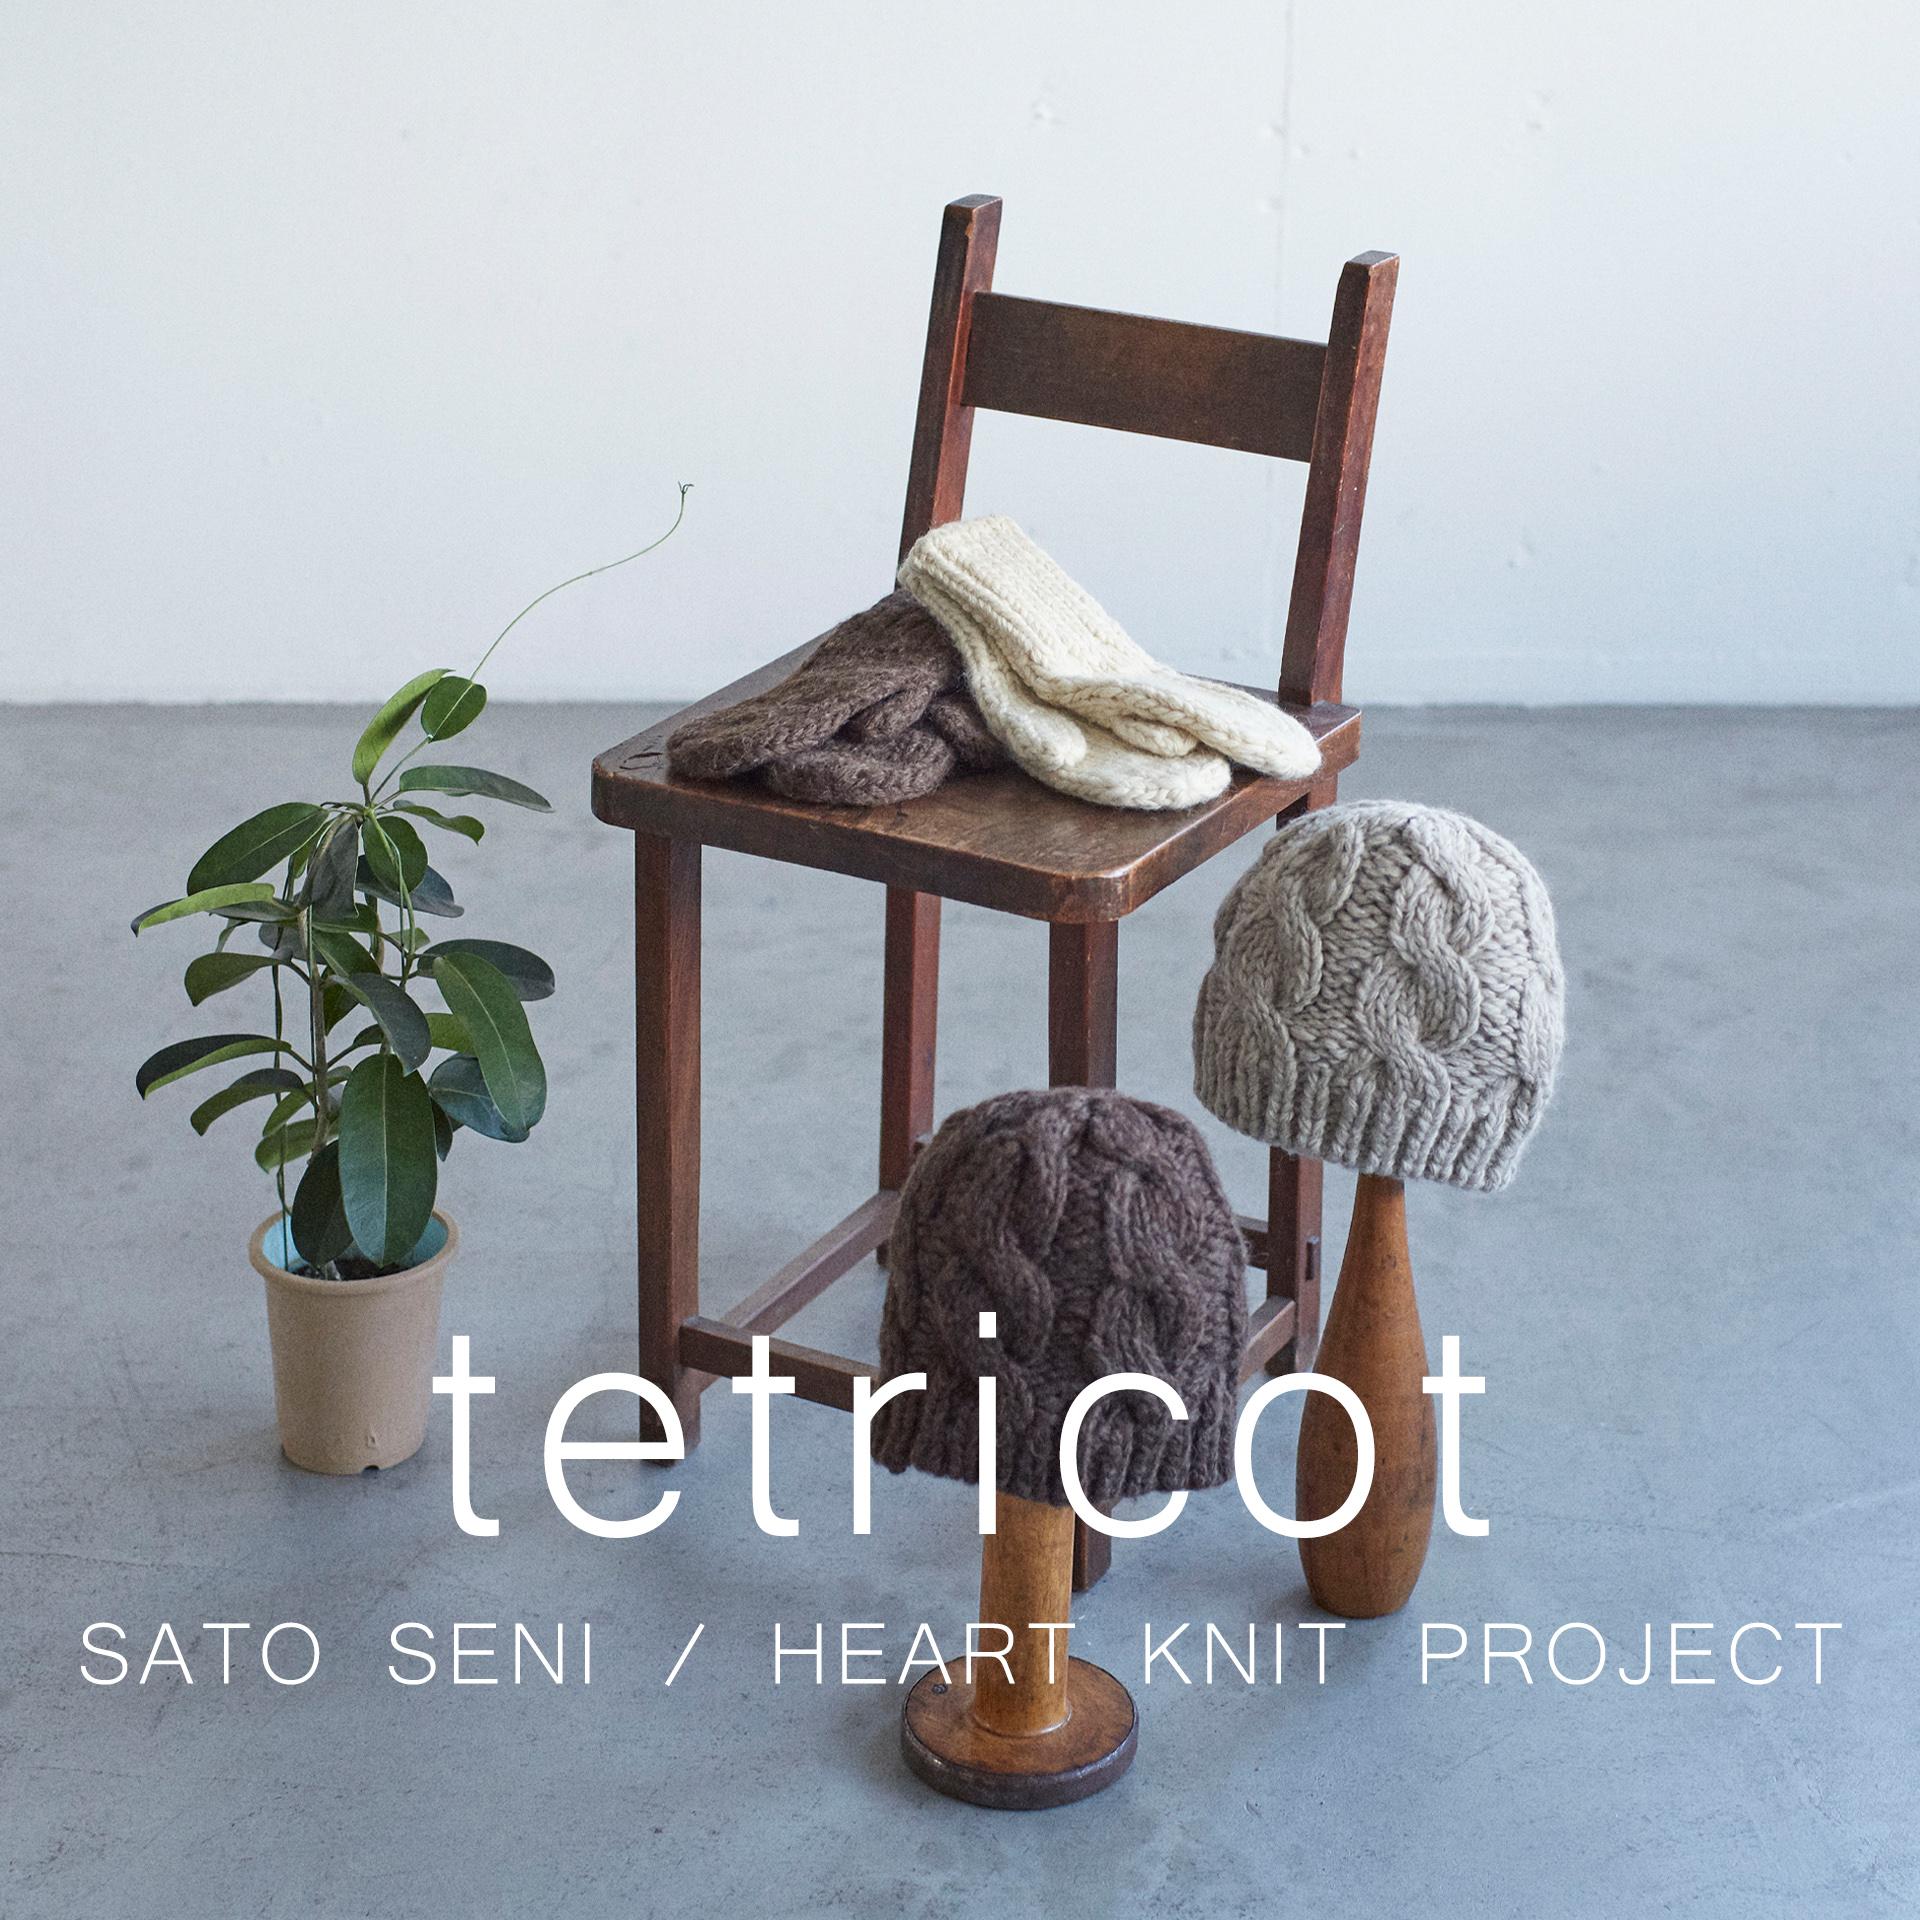 「tetricot」に込められた思いの写真